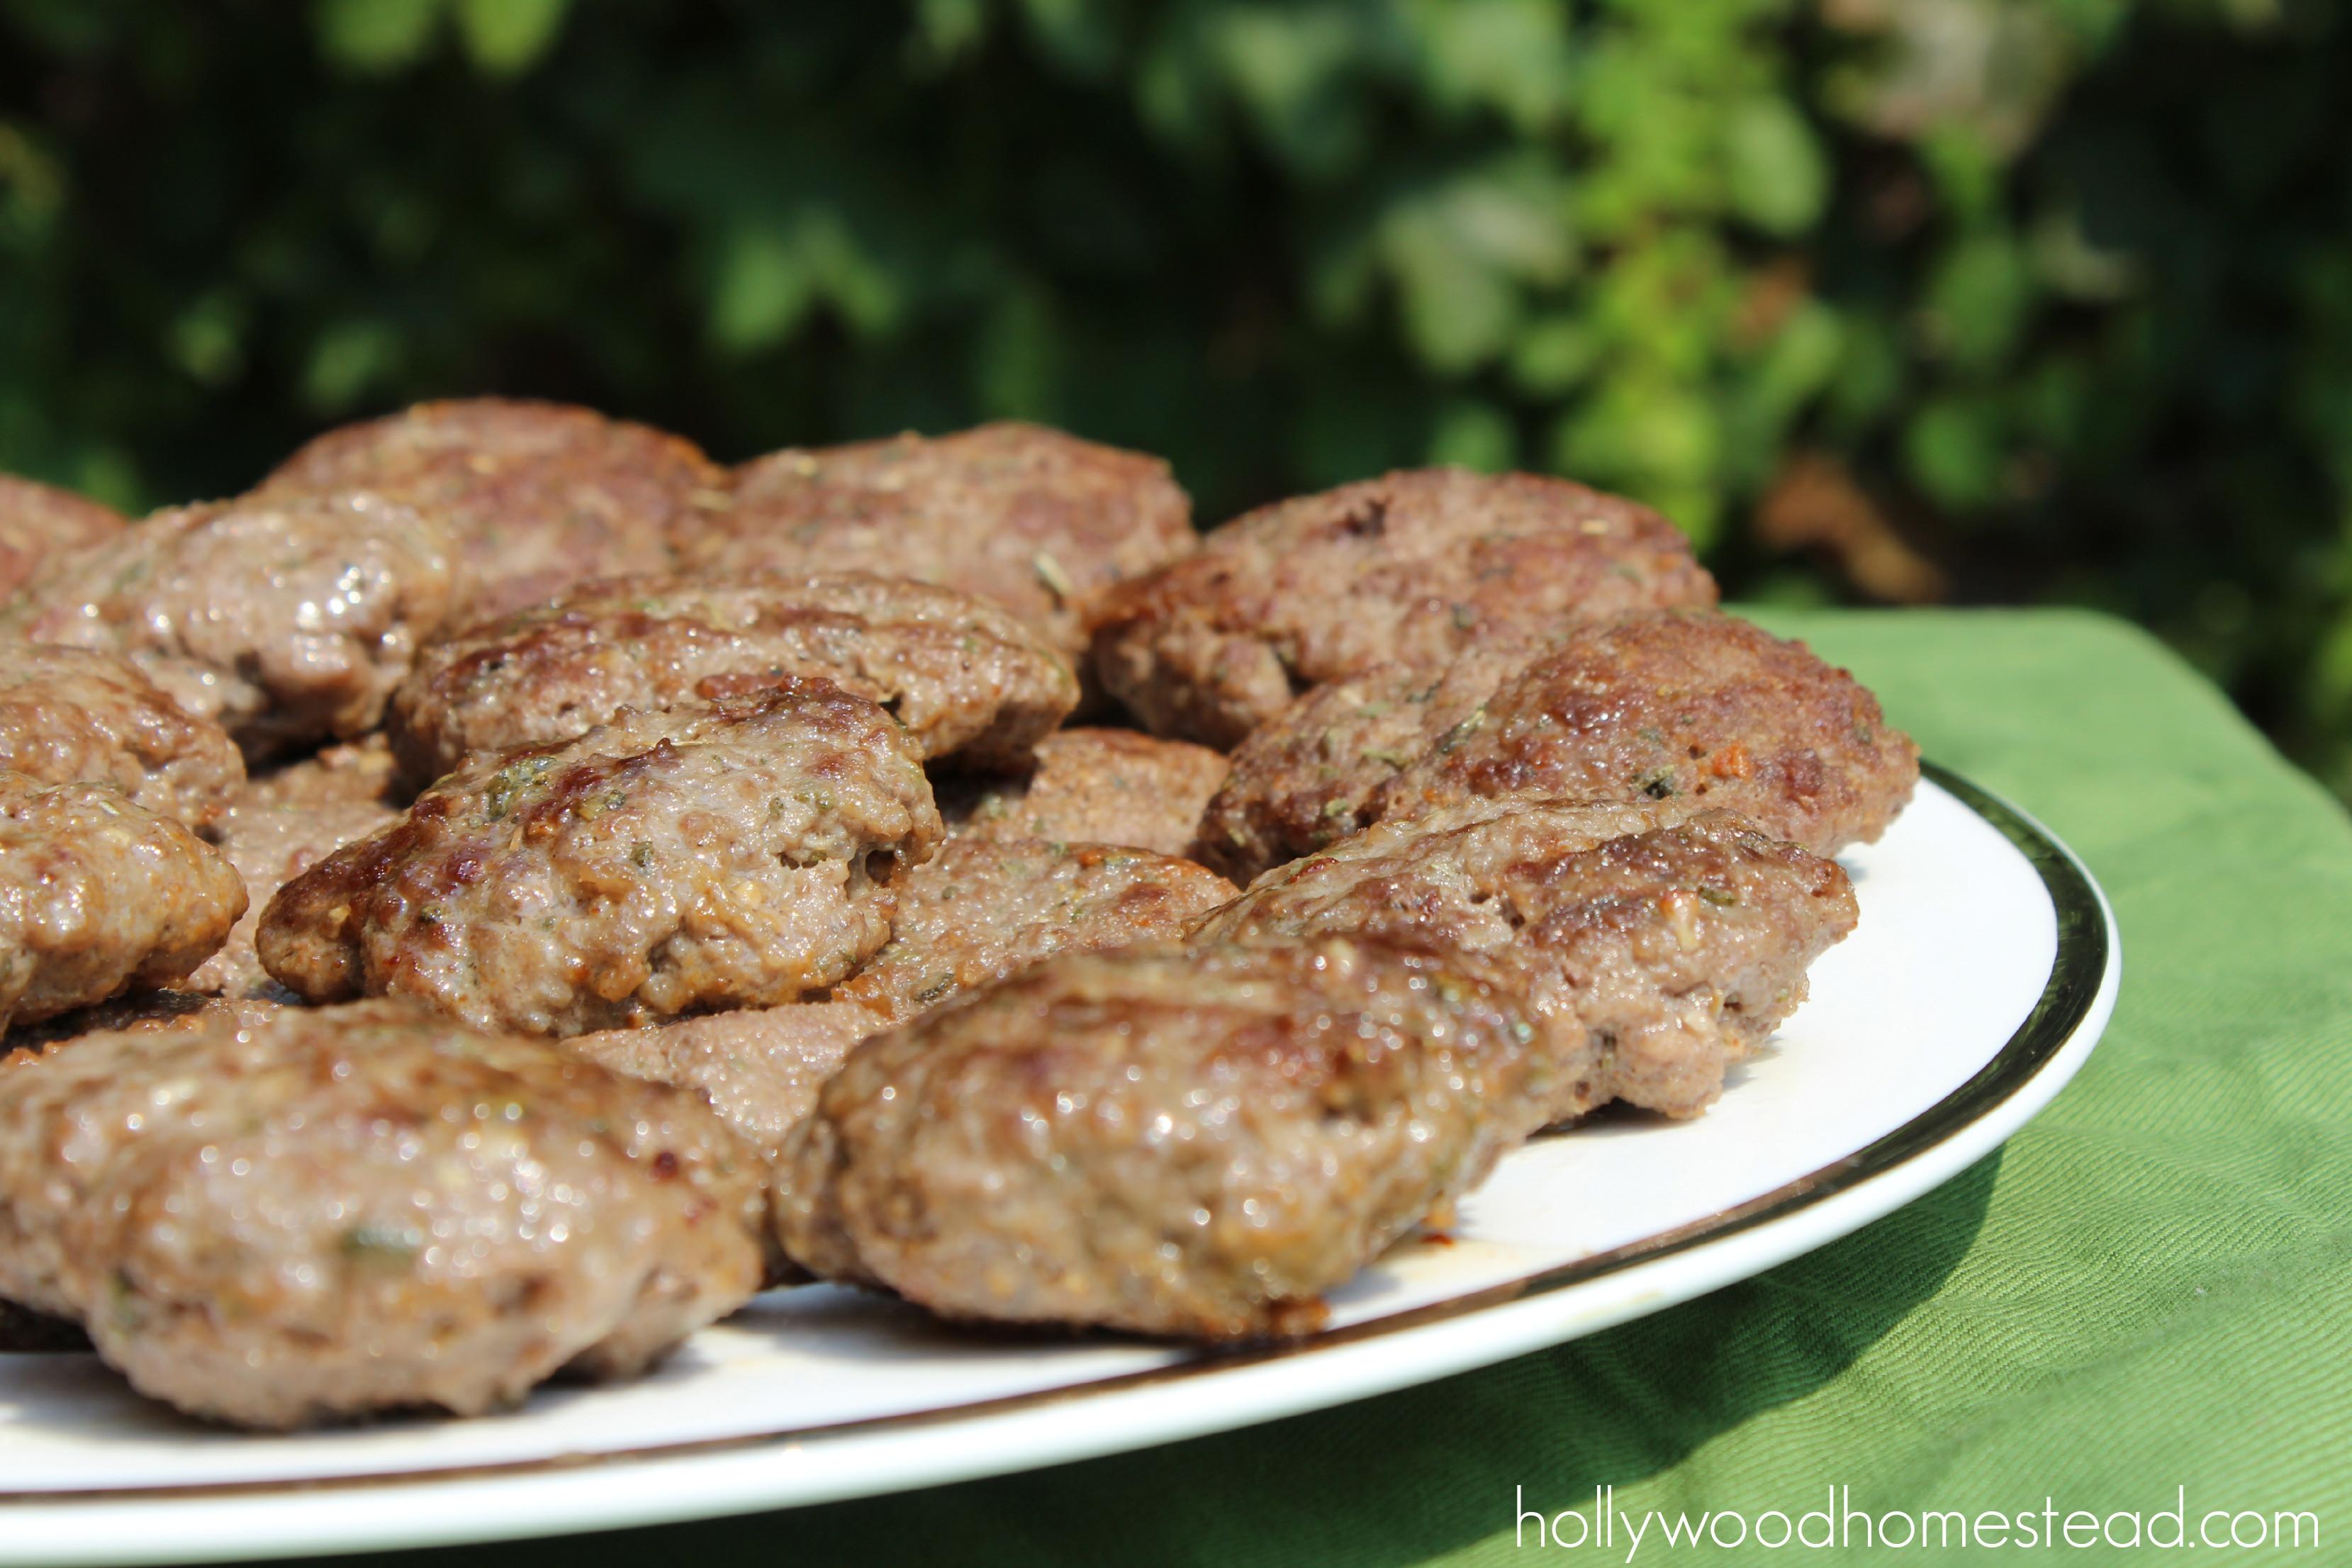 Beef Sausage Recipes  Paleo Beef Breakfast Sausage Recipe Hollywood Homestead